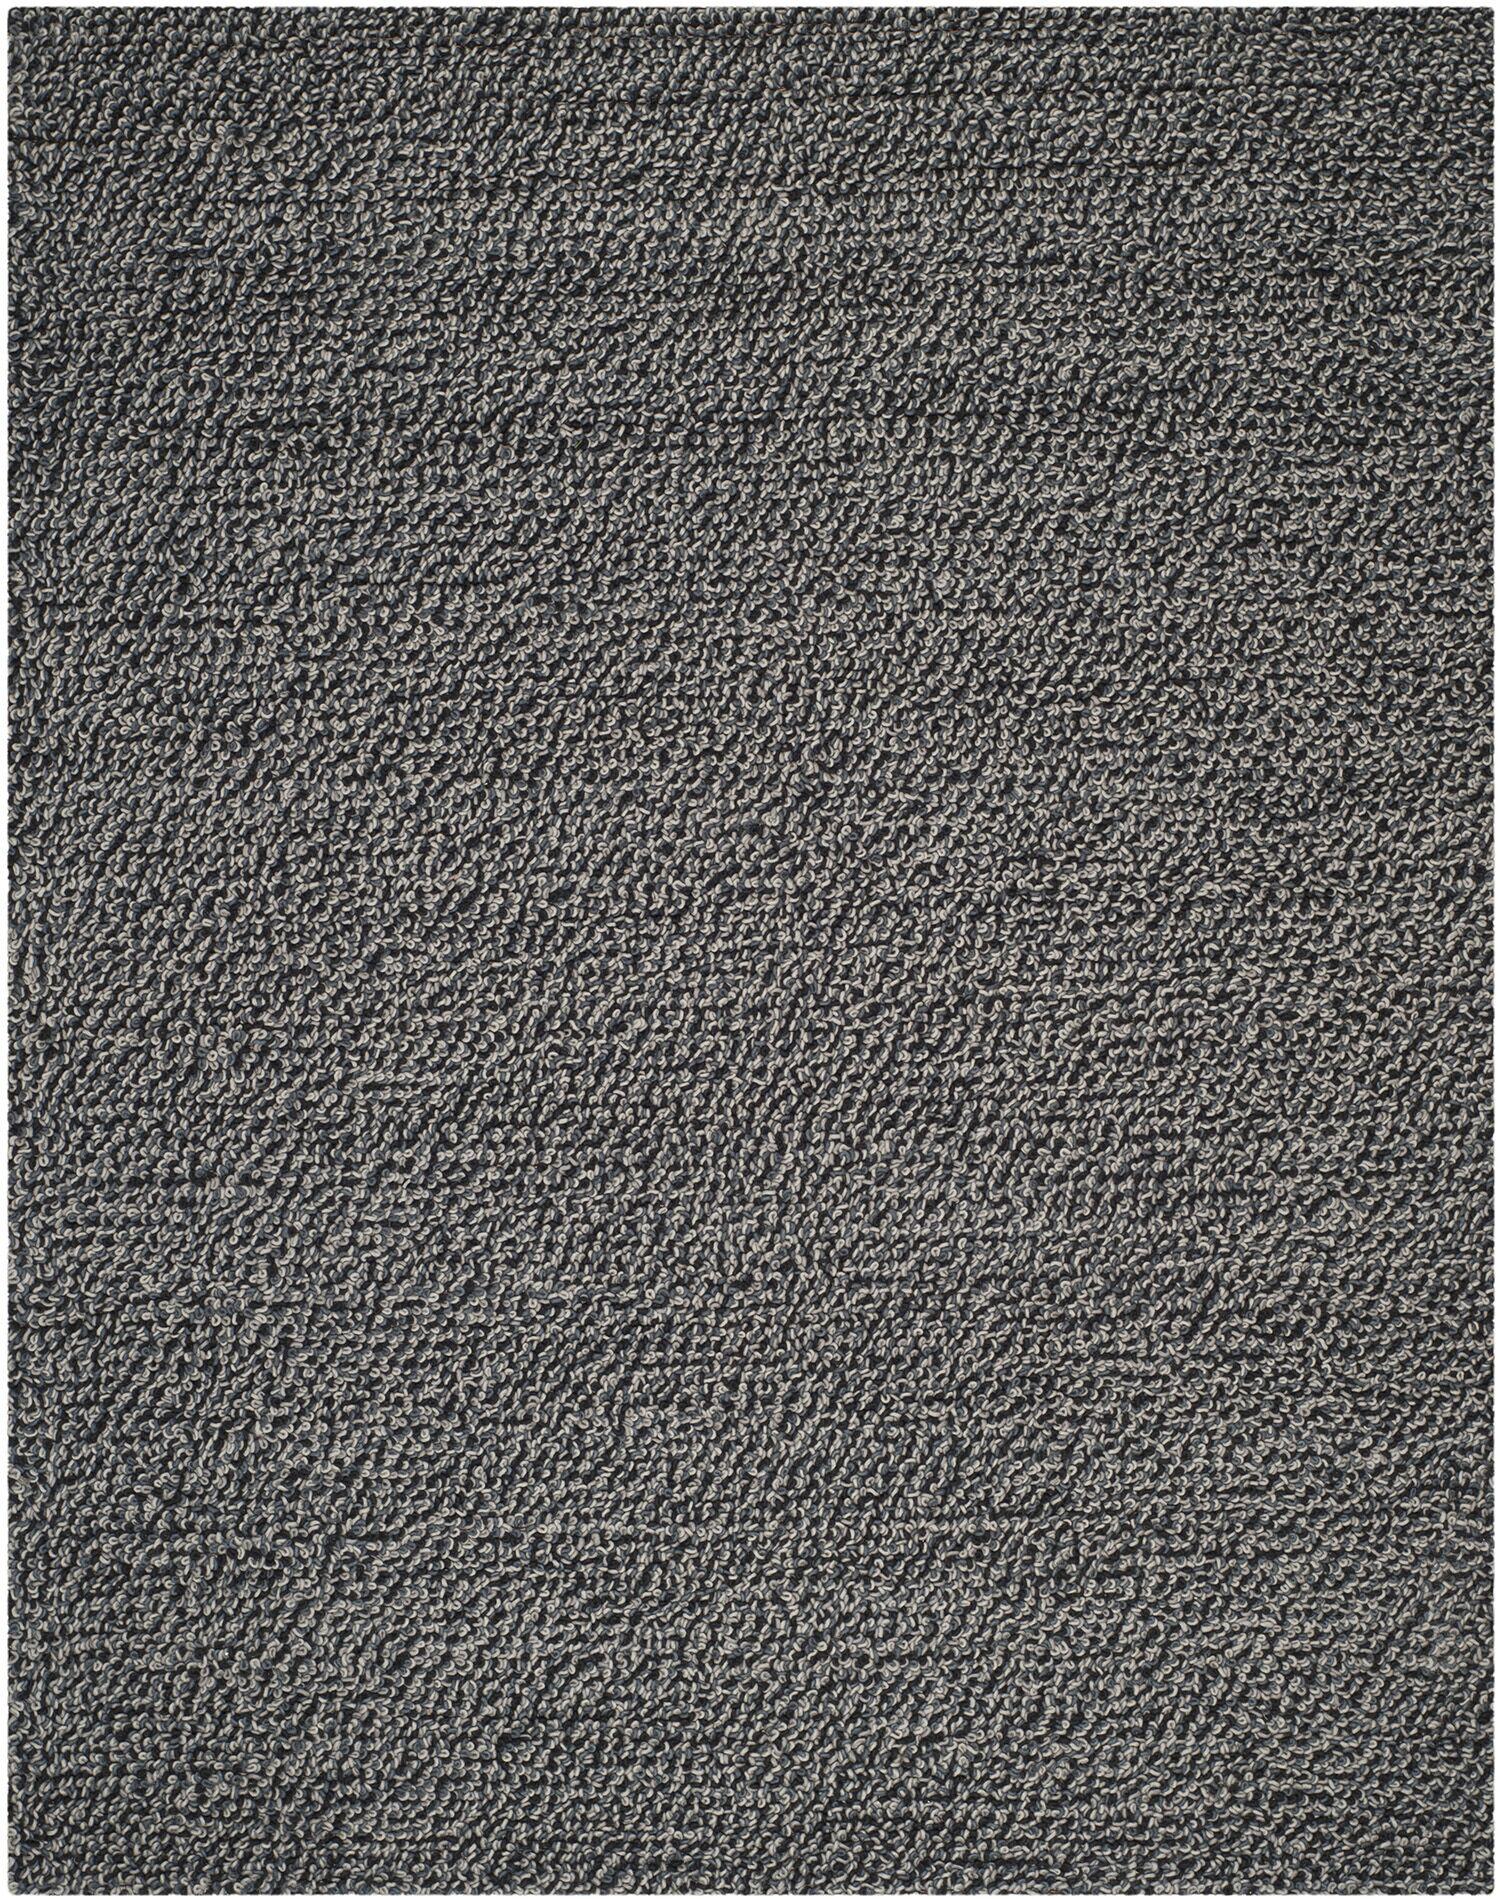 Sinope Dark Gray Area Rug Rug Size: Rectangle 8' x 10'